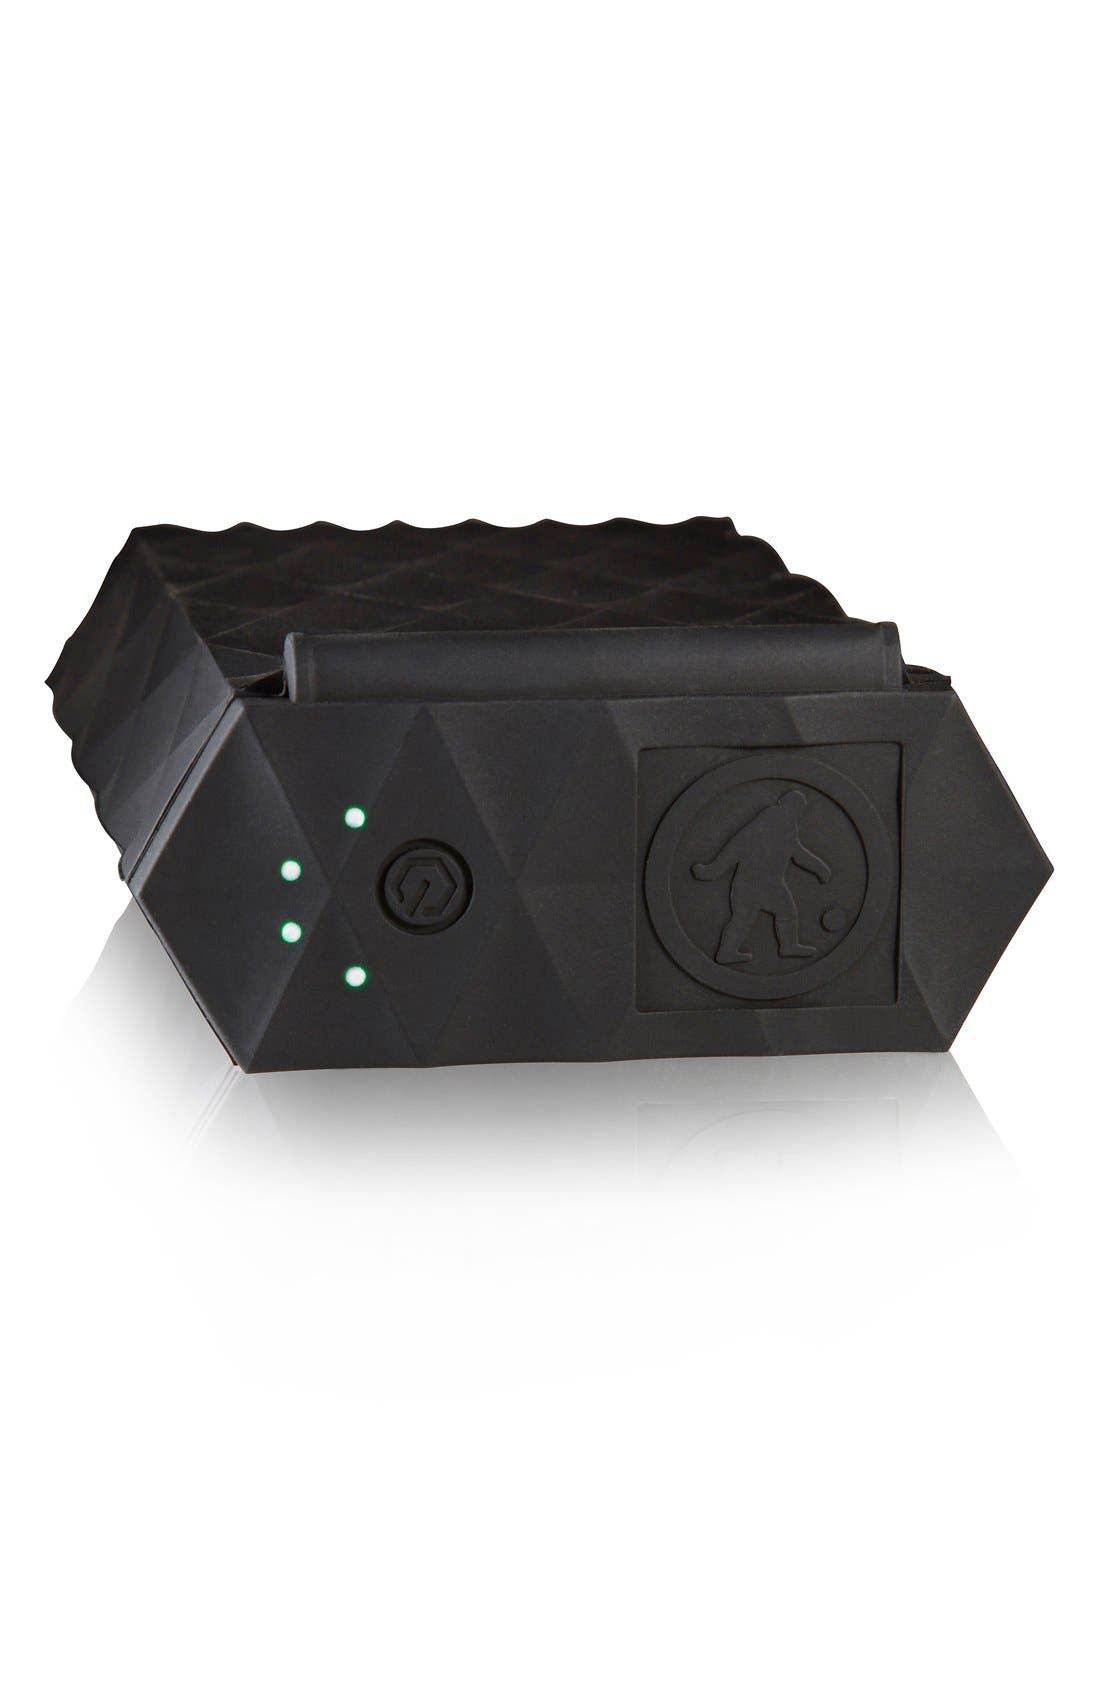 'Kodiak' Portable Power Bank,                             Alternate thumbnail 3, color,                             001